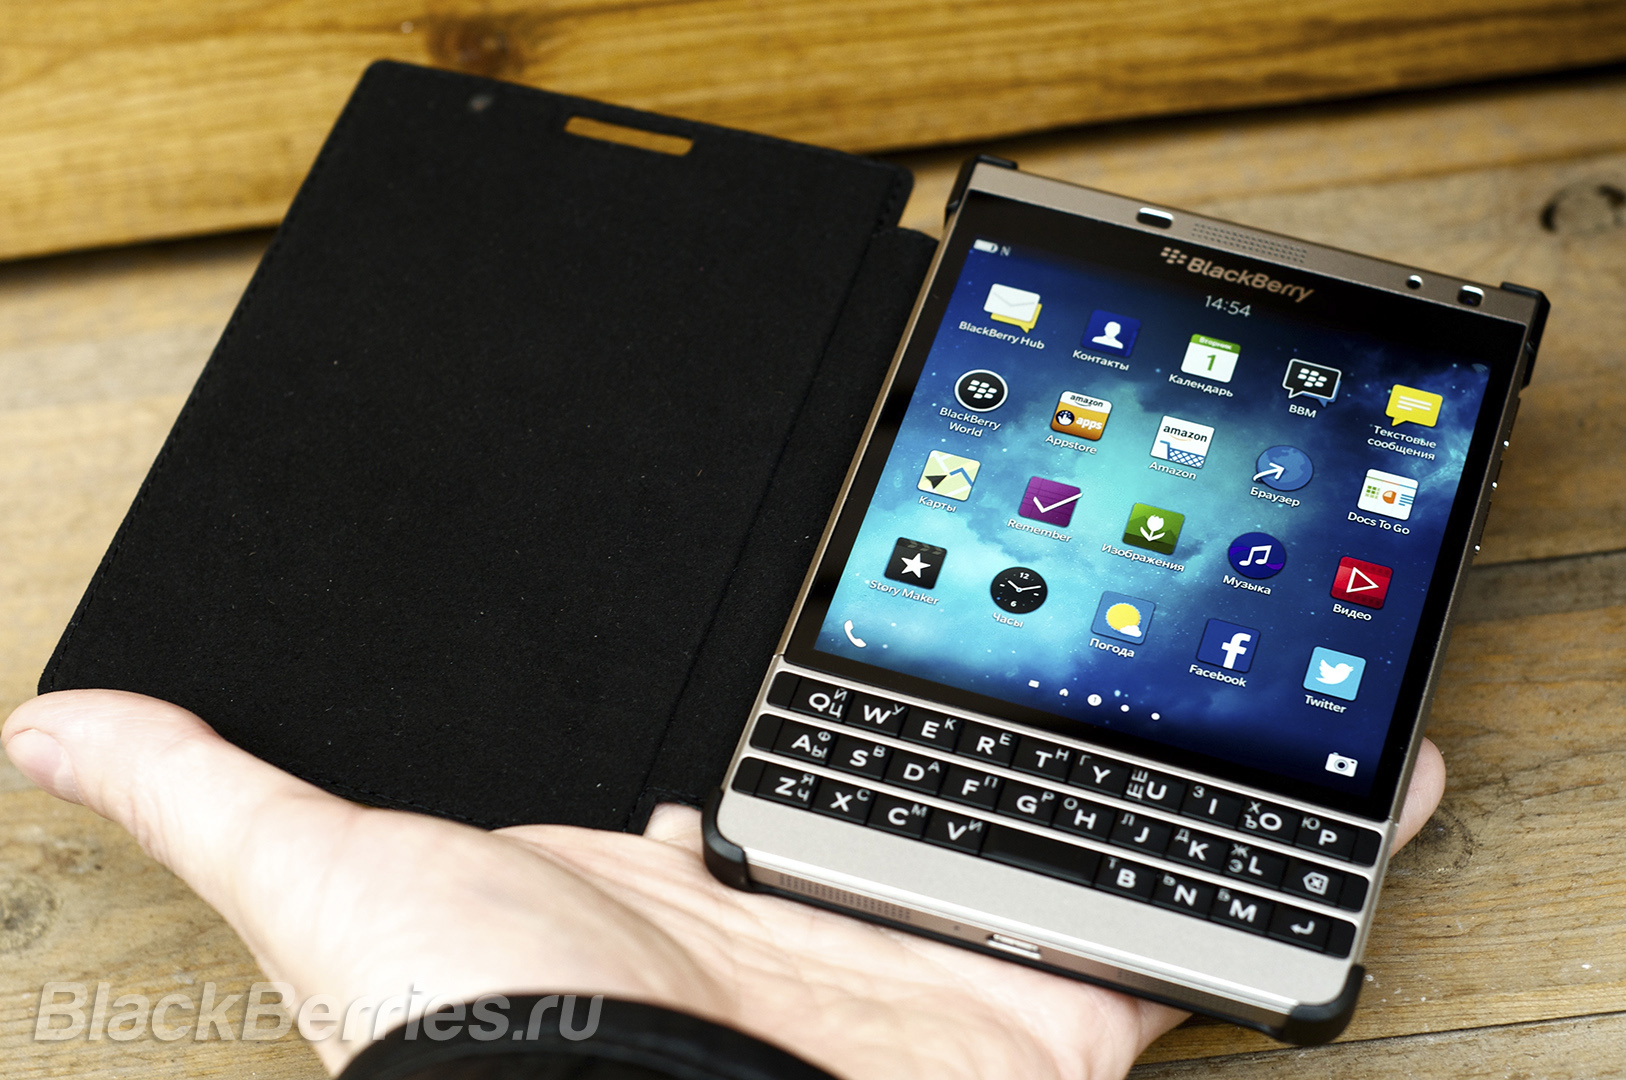 BlackBerry-Passport-Silver-Edition-Cases-13